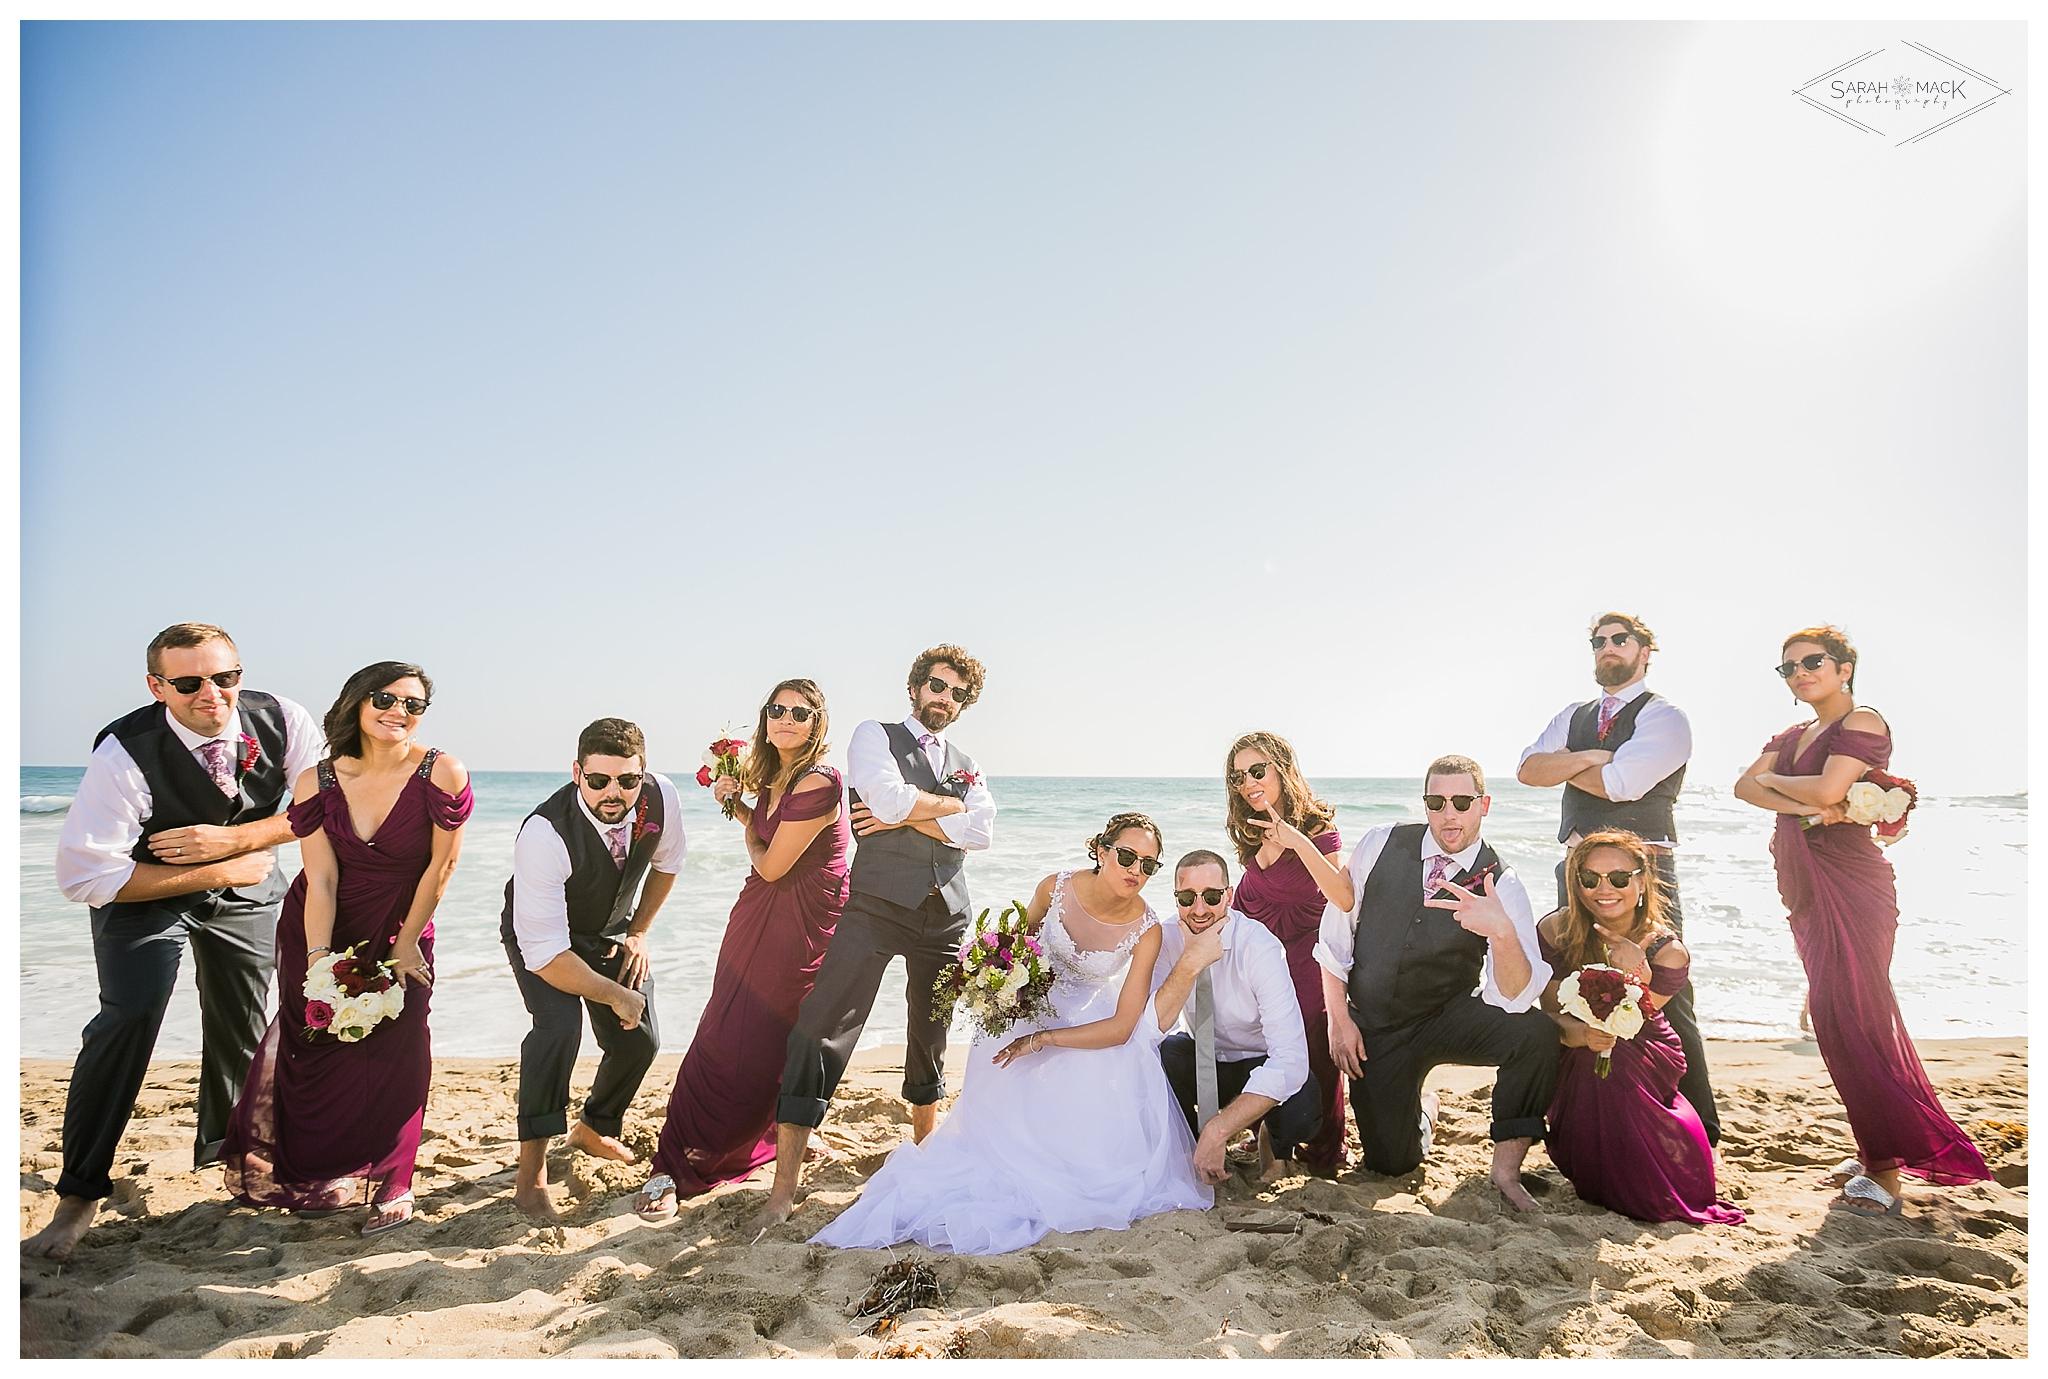 MR-Sea-Cliffe-Country-Club-Huntington-Beach-Wedding-0100.jpg